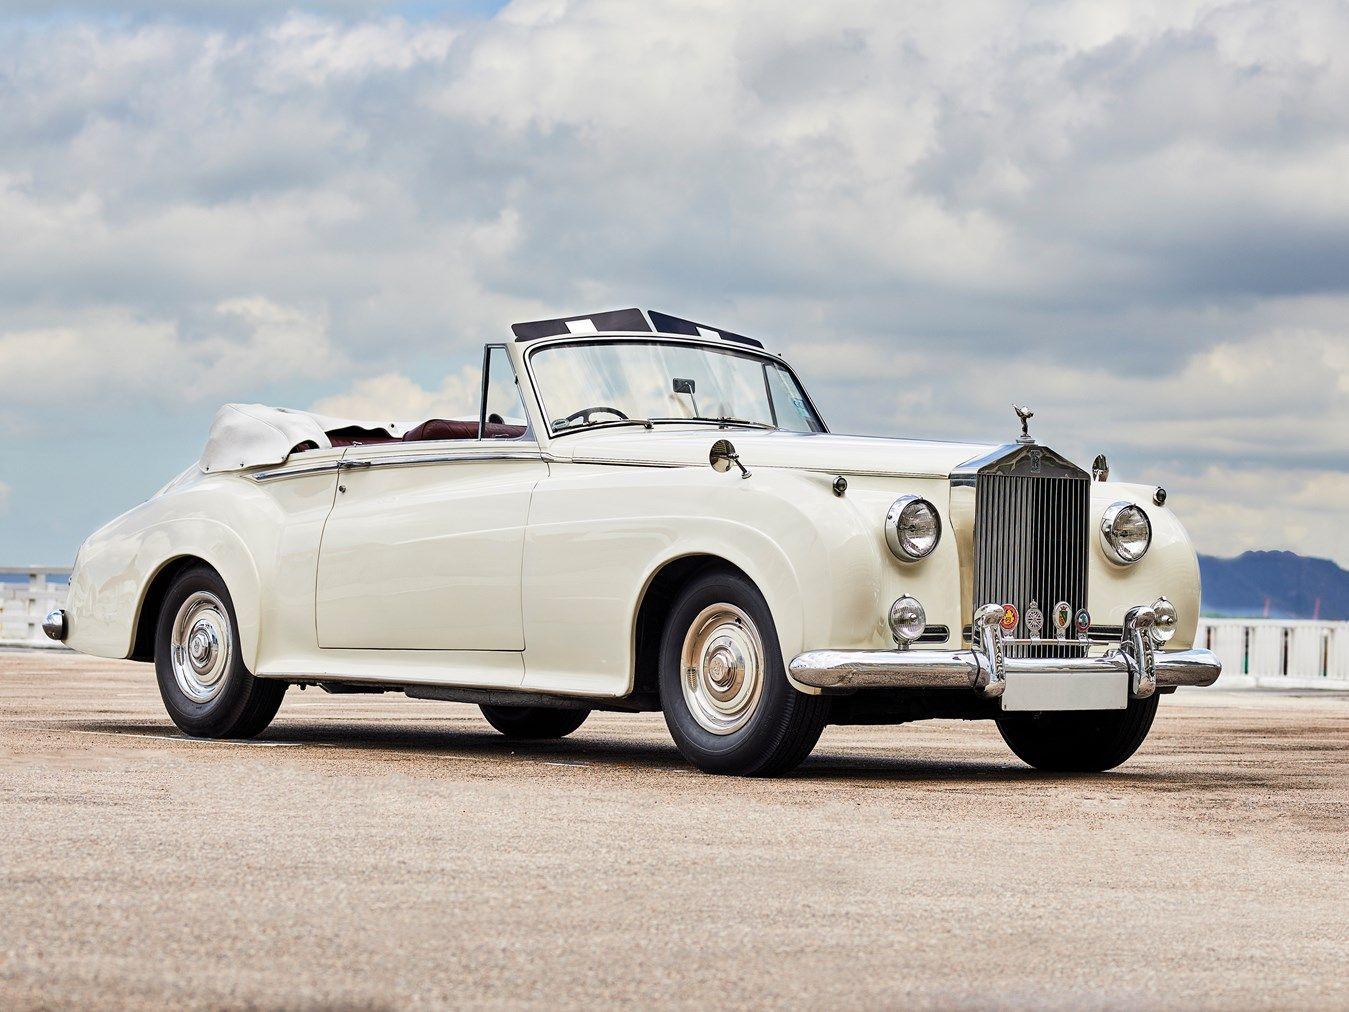 1960 Rolls Royce Silver Cloud Ii Drophead Coupe Adaptation By H J